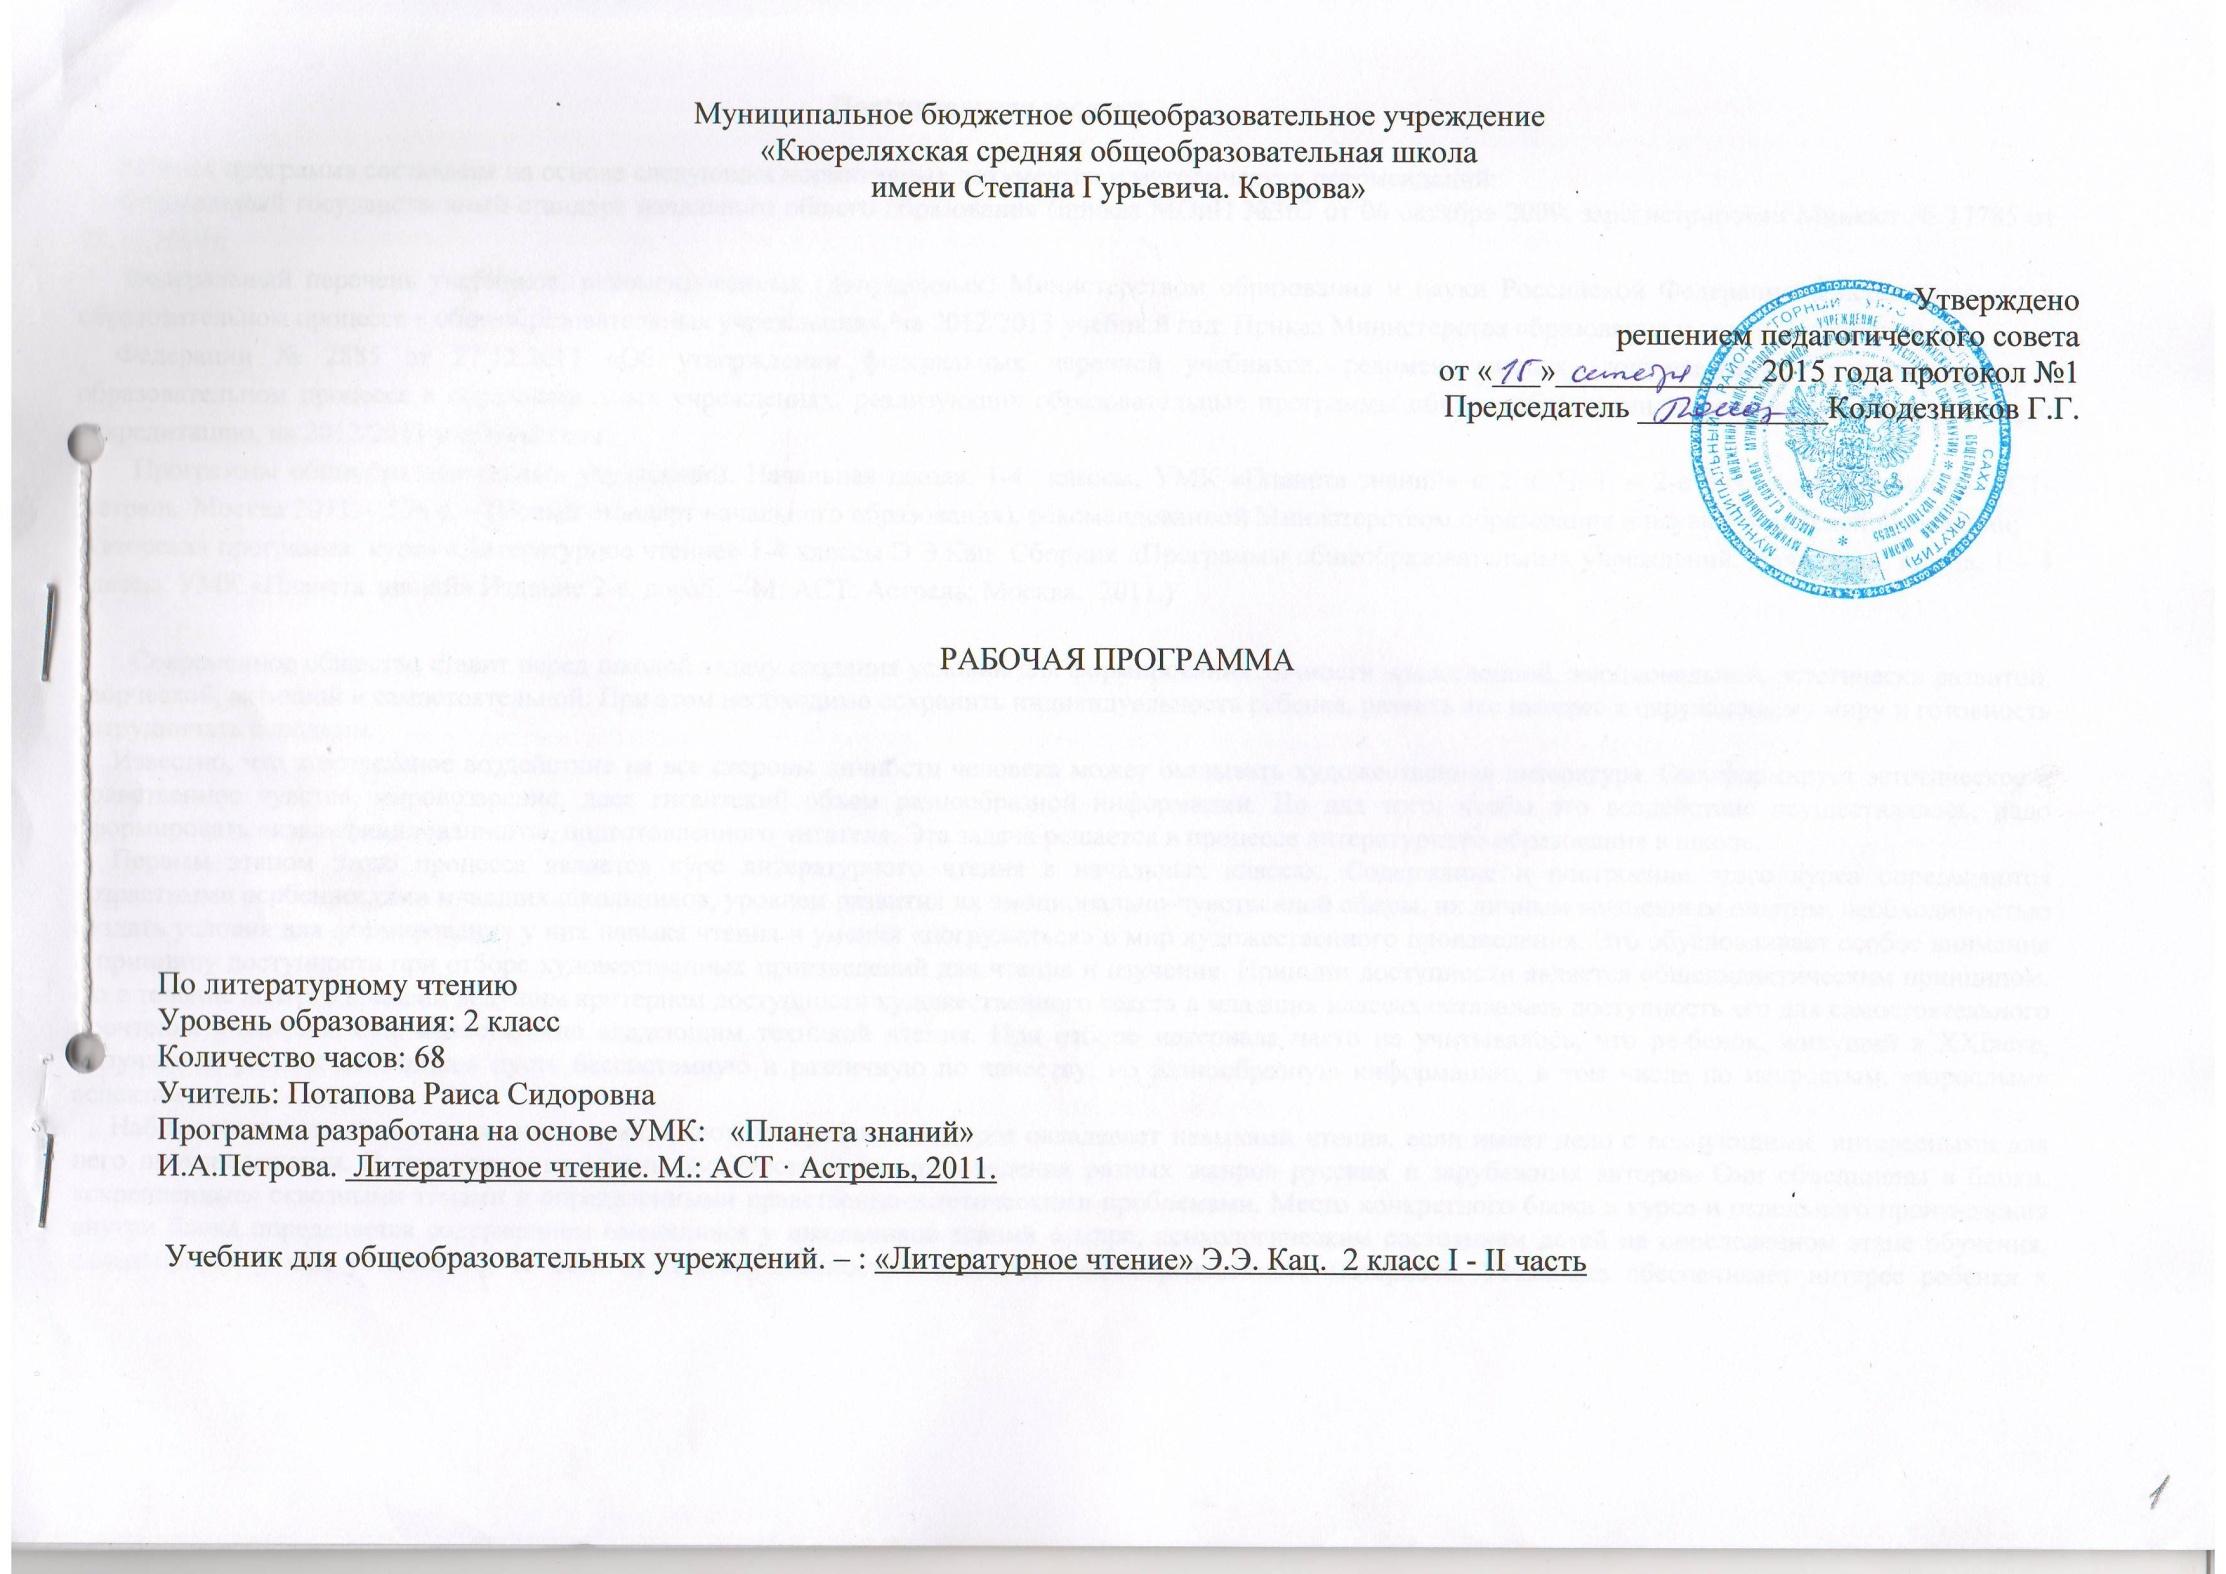 E:\Раиса Сидоровна\2015-2016\10001.JPG